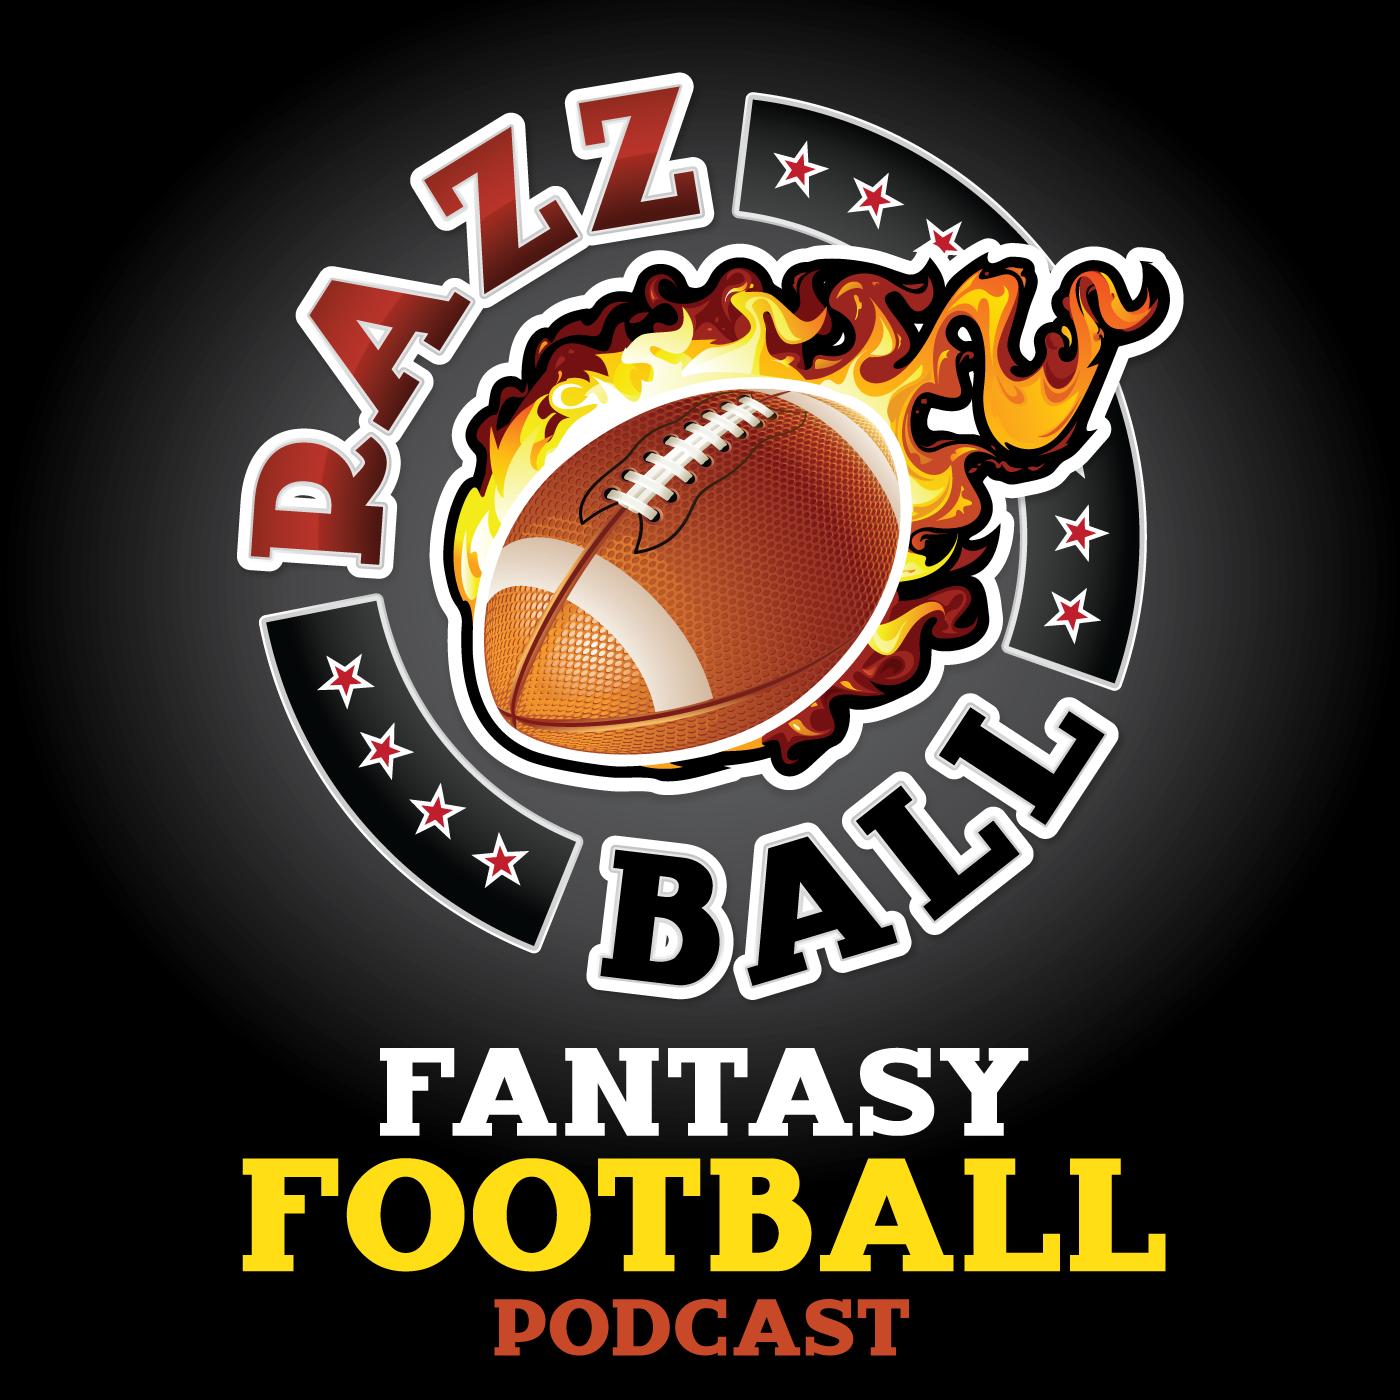 Fantasy Football Blog at Razzball.com